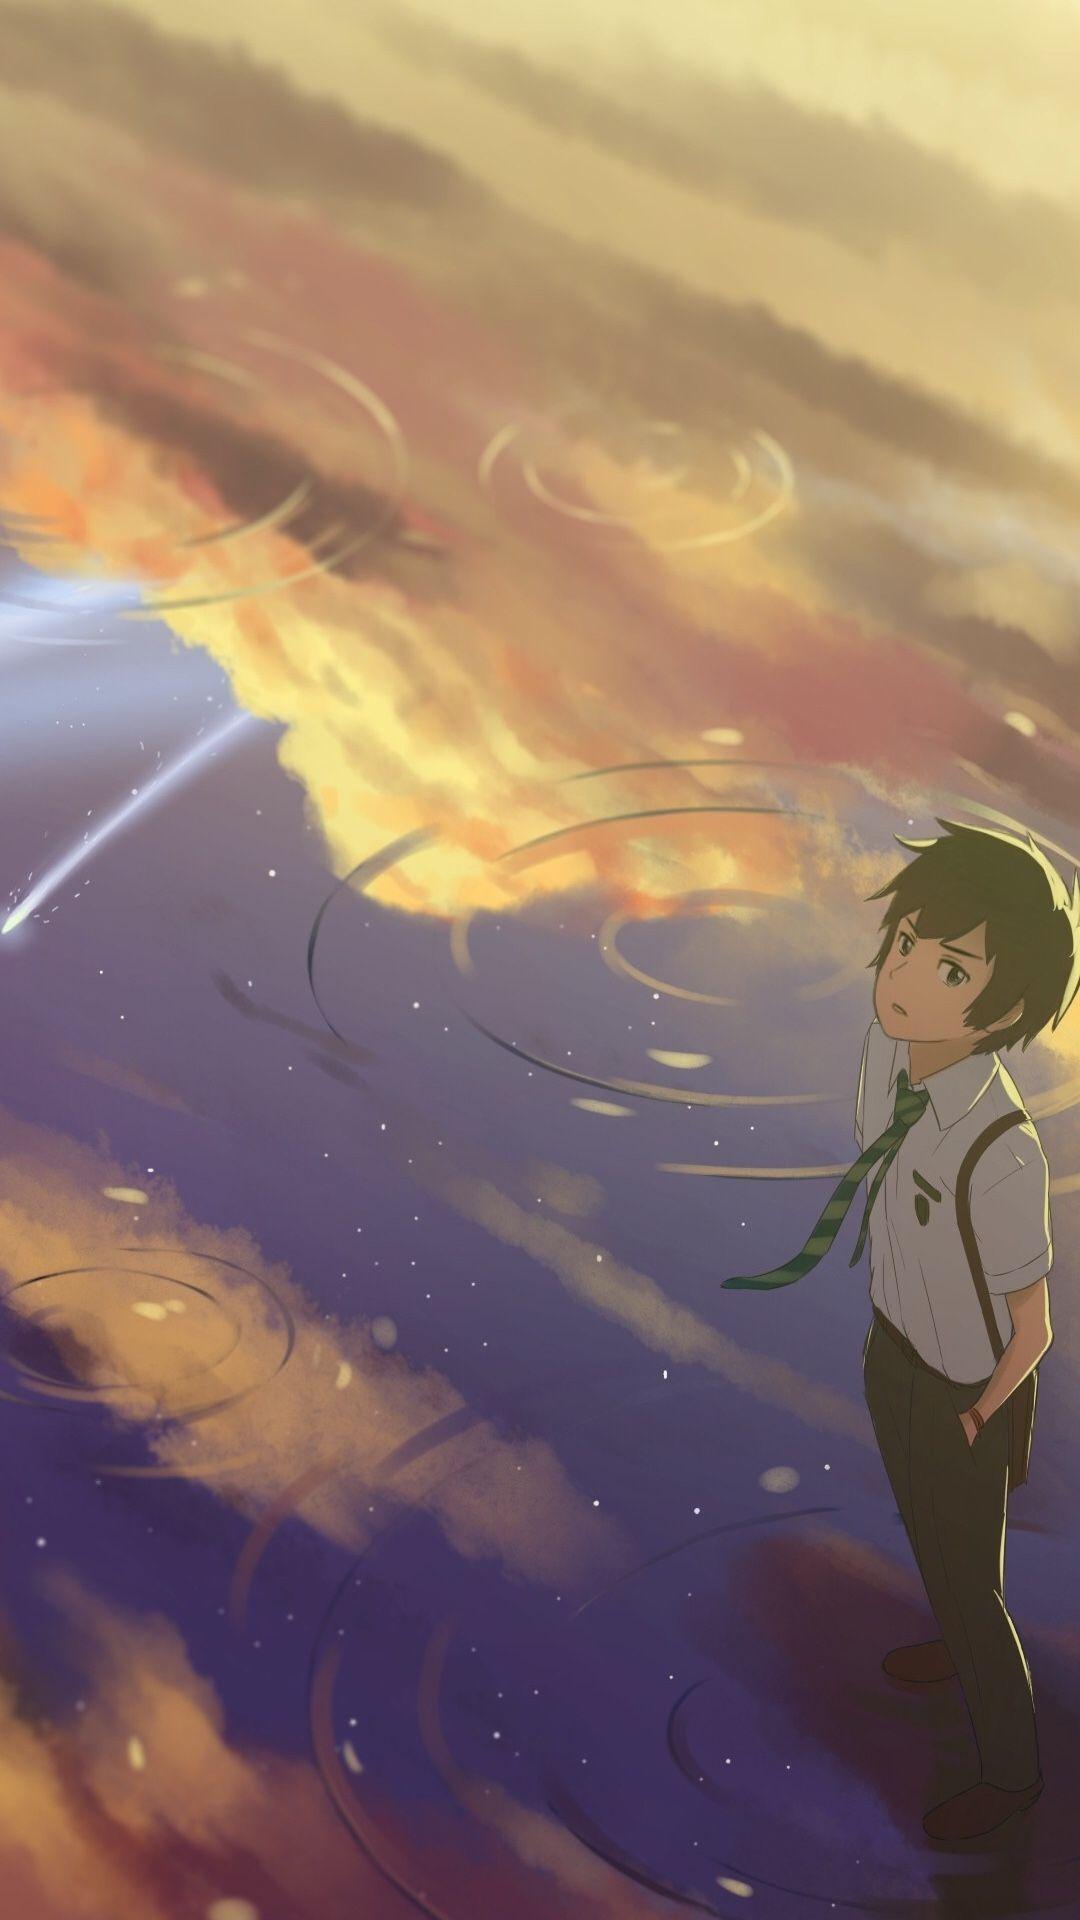 Épinglé sur Enjoy Animes Wallpapers